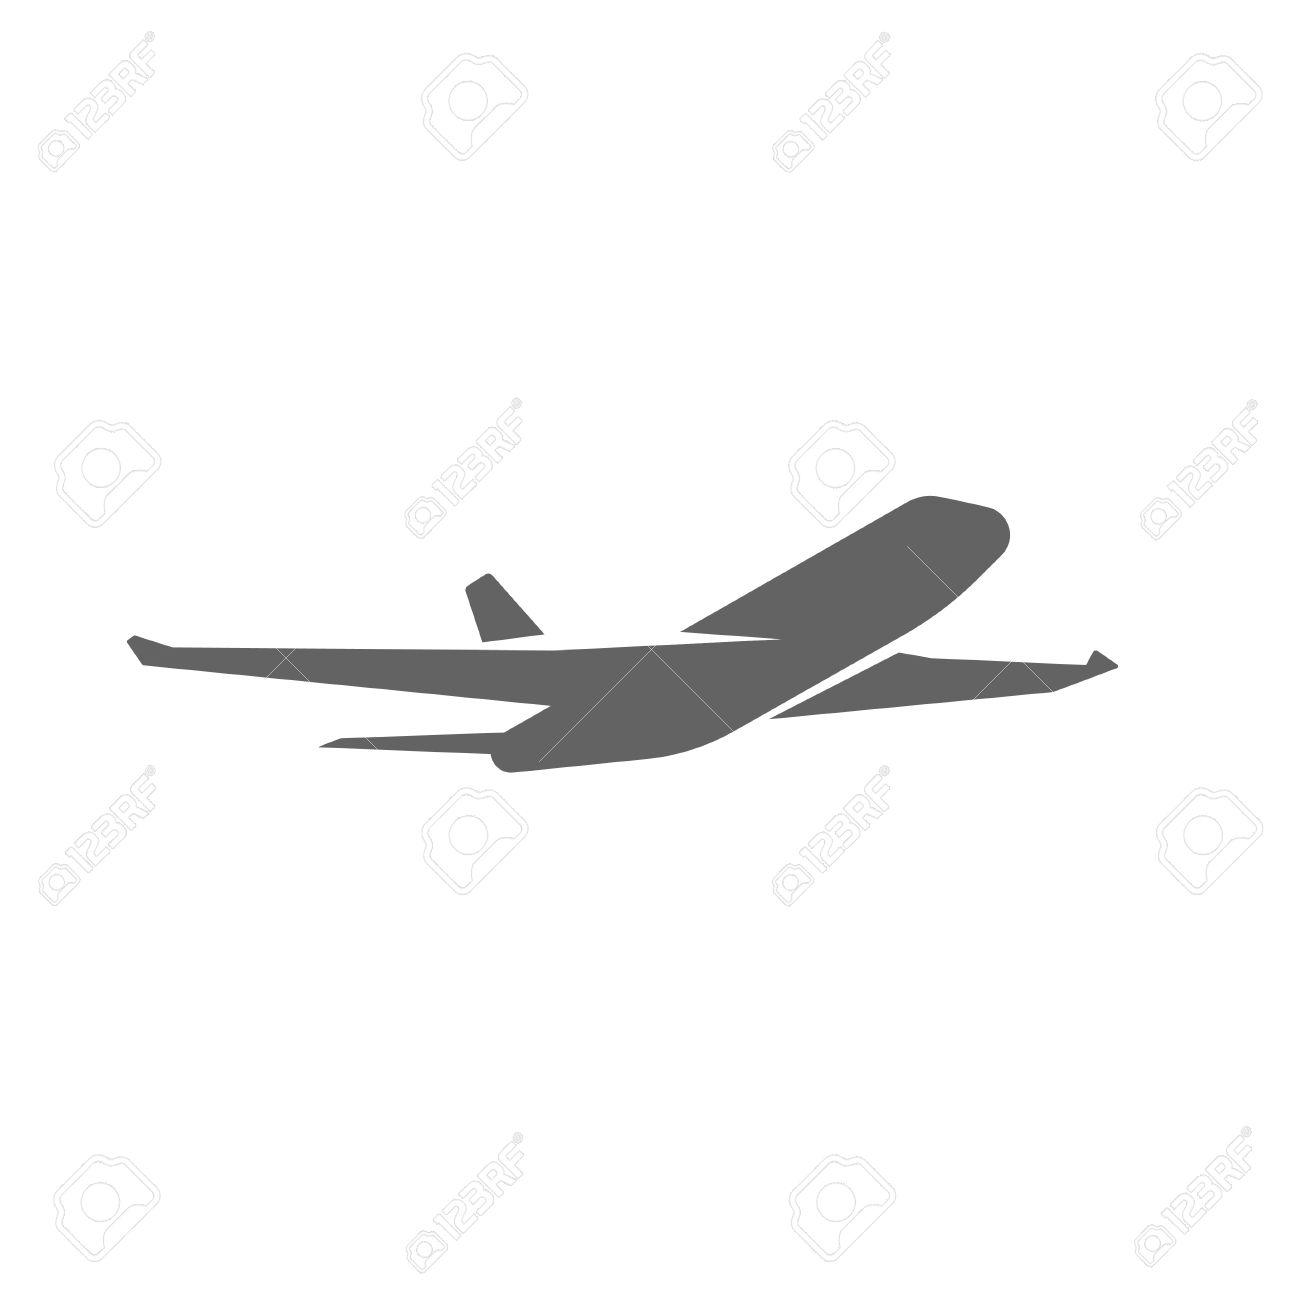 Plane taking off silhouette vector illustration, black airplane